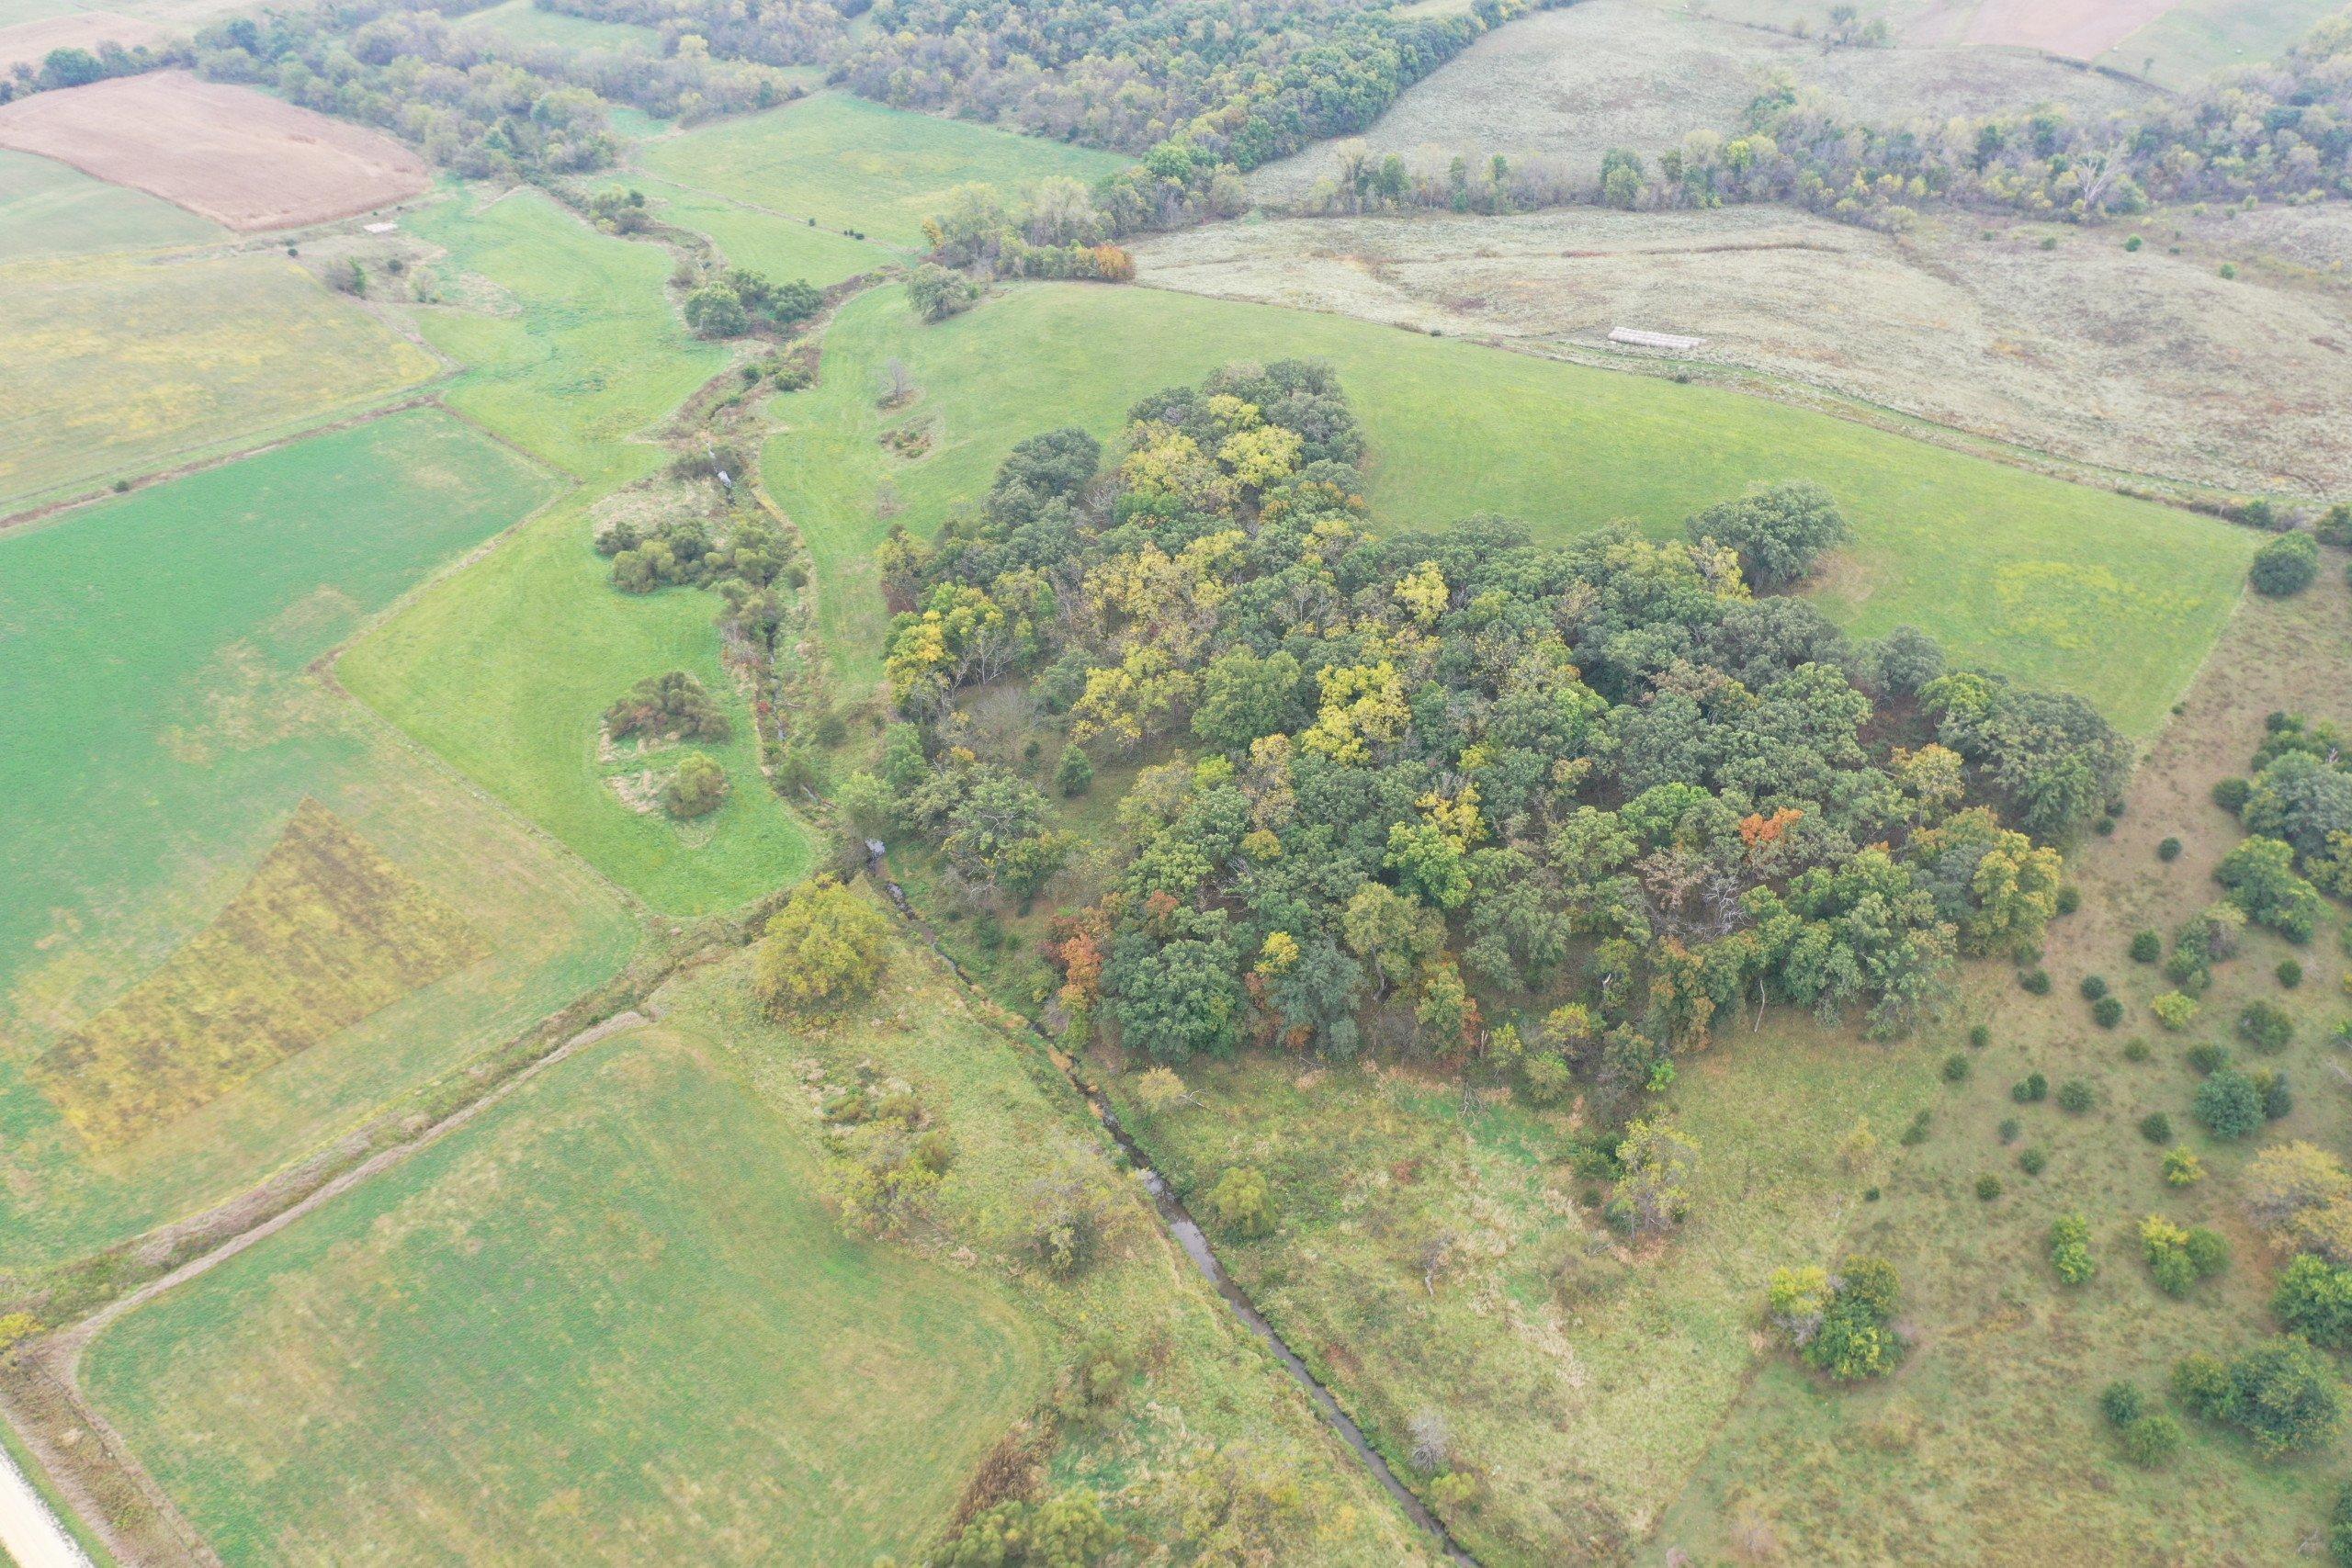 land-warren-county-iowa-200-acres-listing-number-15810-DJI_0612-4.jpg